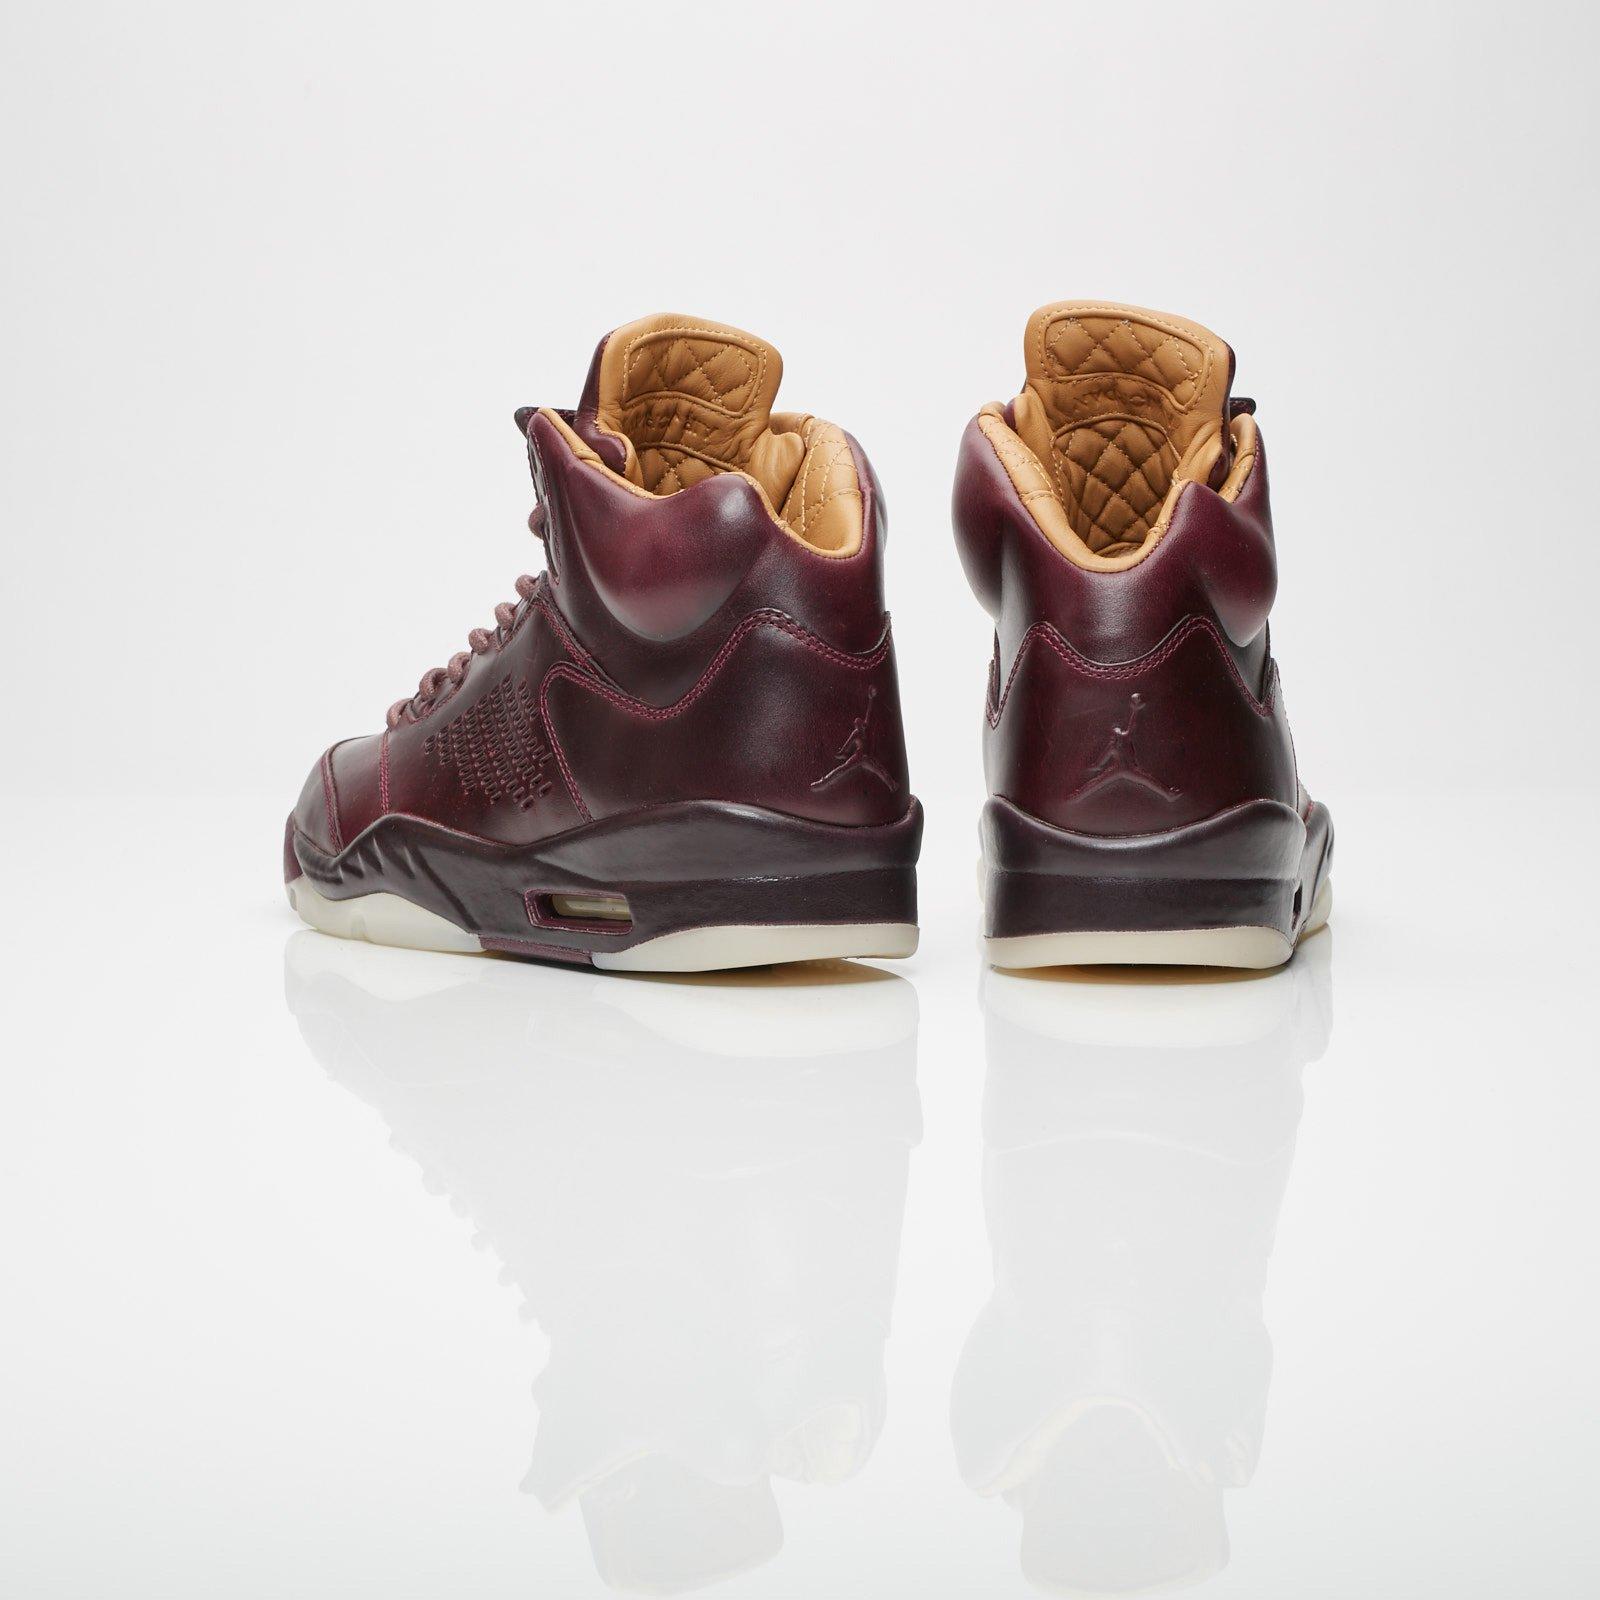 more photos a7452 74b29 Jordan Brand Air Jordan 5 Retro Premium - 881432-612 - Sneakersnstuff    sneakers   streetwear online since 1999